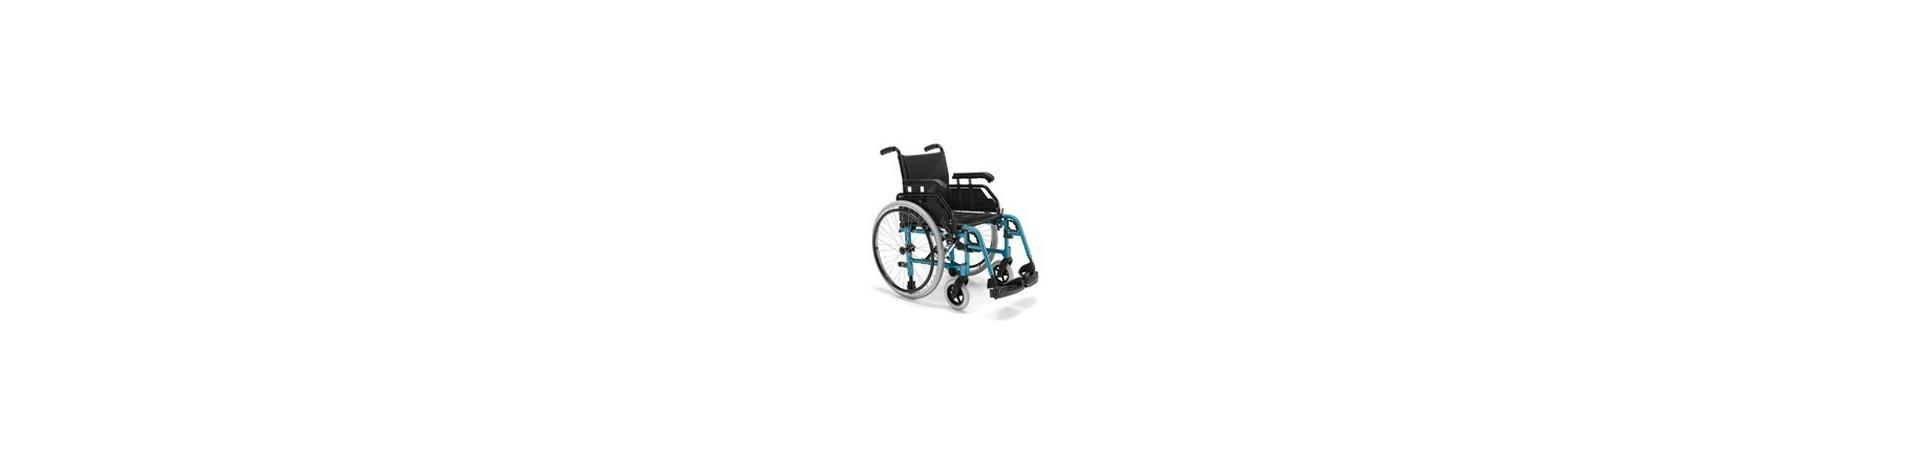 Carrozine per disabili